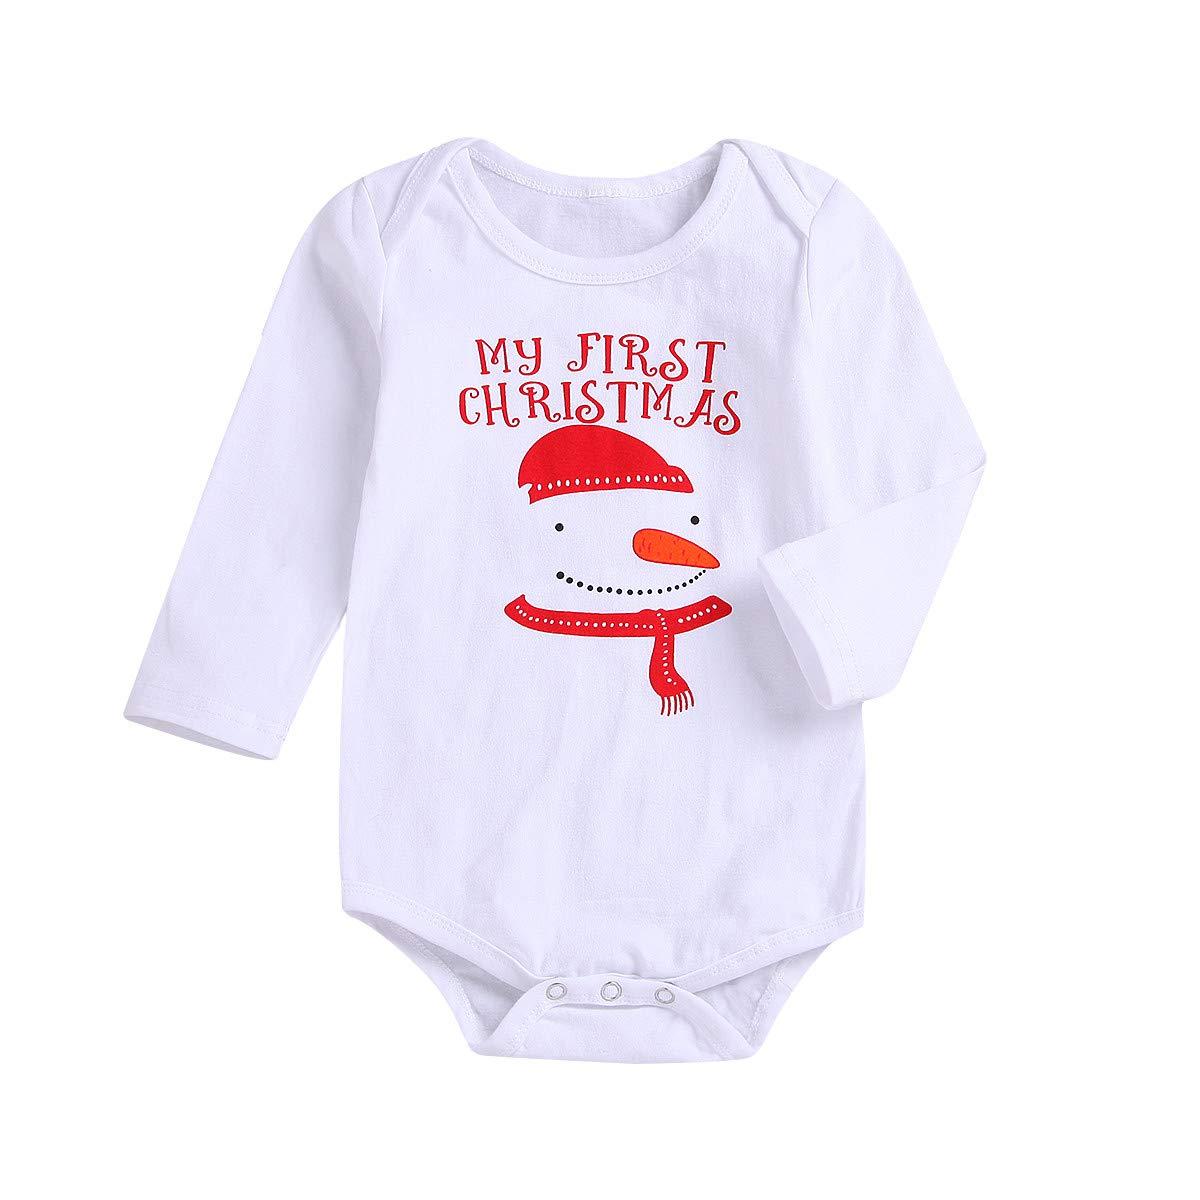 OCEAN-STORE Newborn Baby Girl Boy Snow Man Print Romper Jumpsuit Clothes ON-12 ON-123